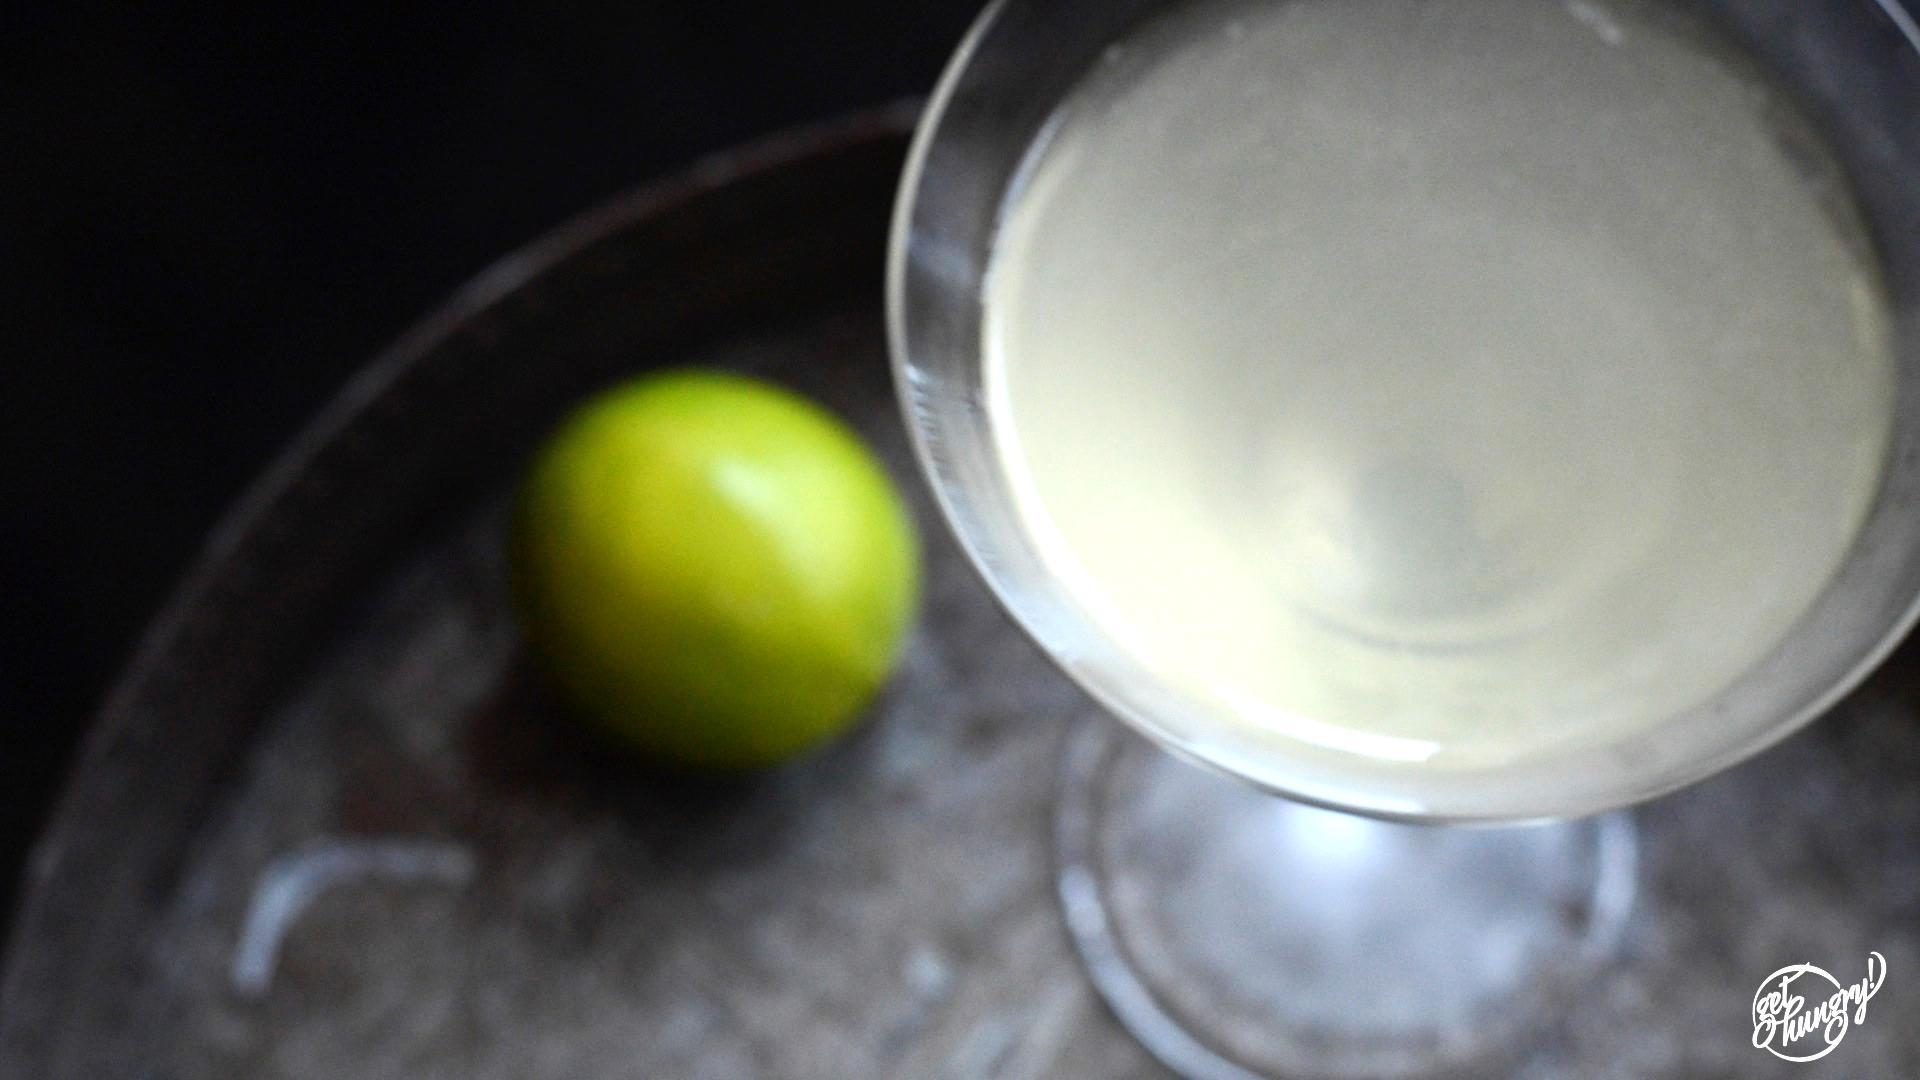 Gimlet_Cocktail_gethungry_01.jpg